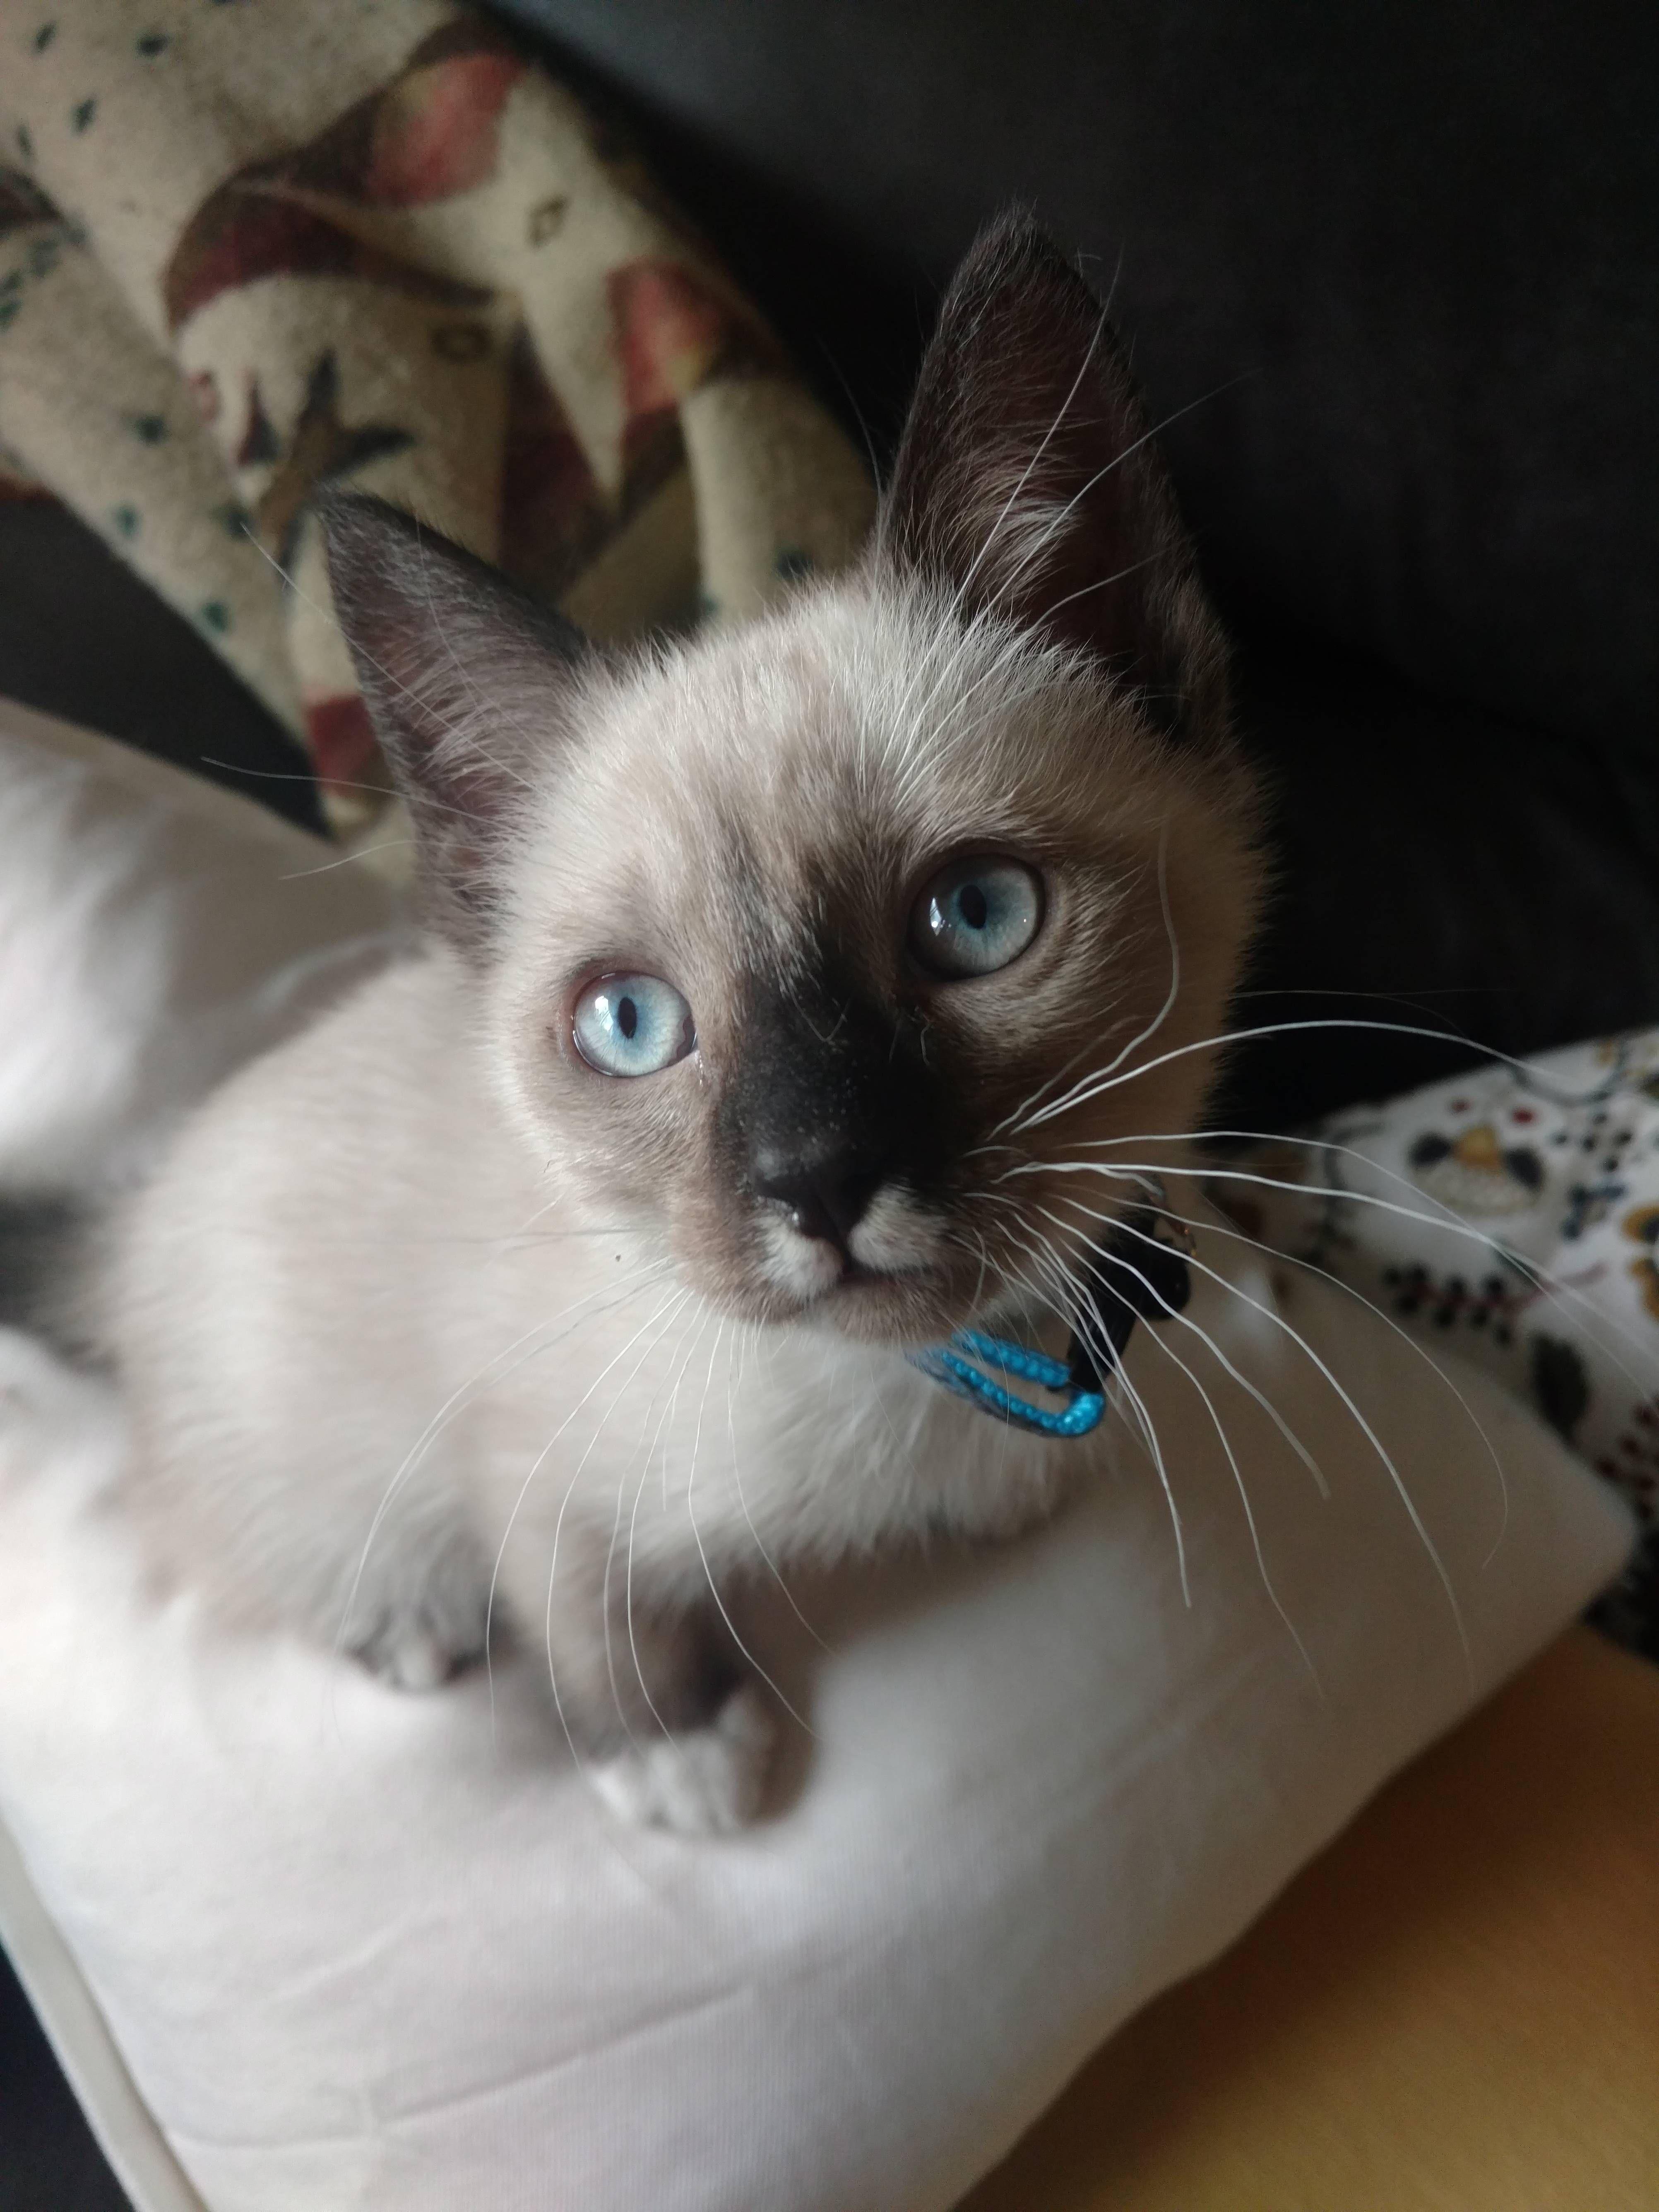 Kubo freshly adopted http://ift.tt/2qpmy37